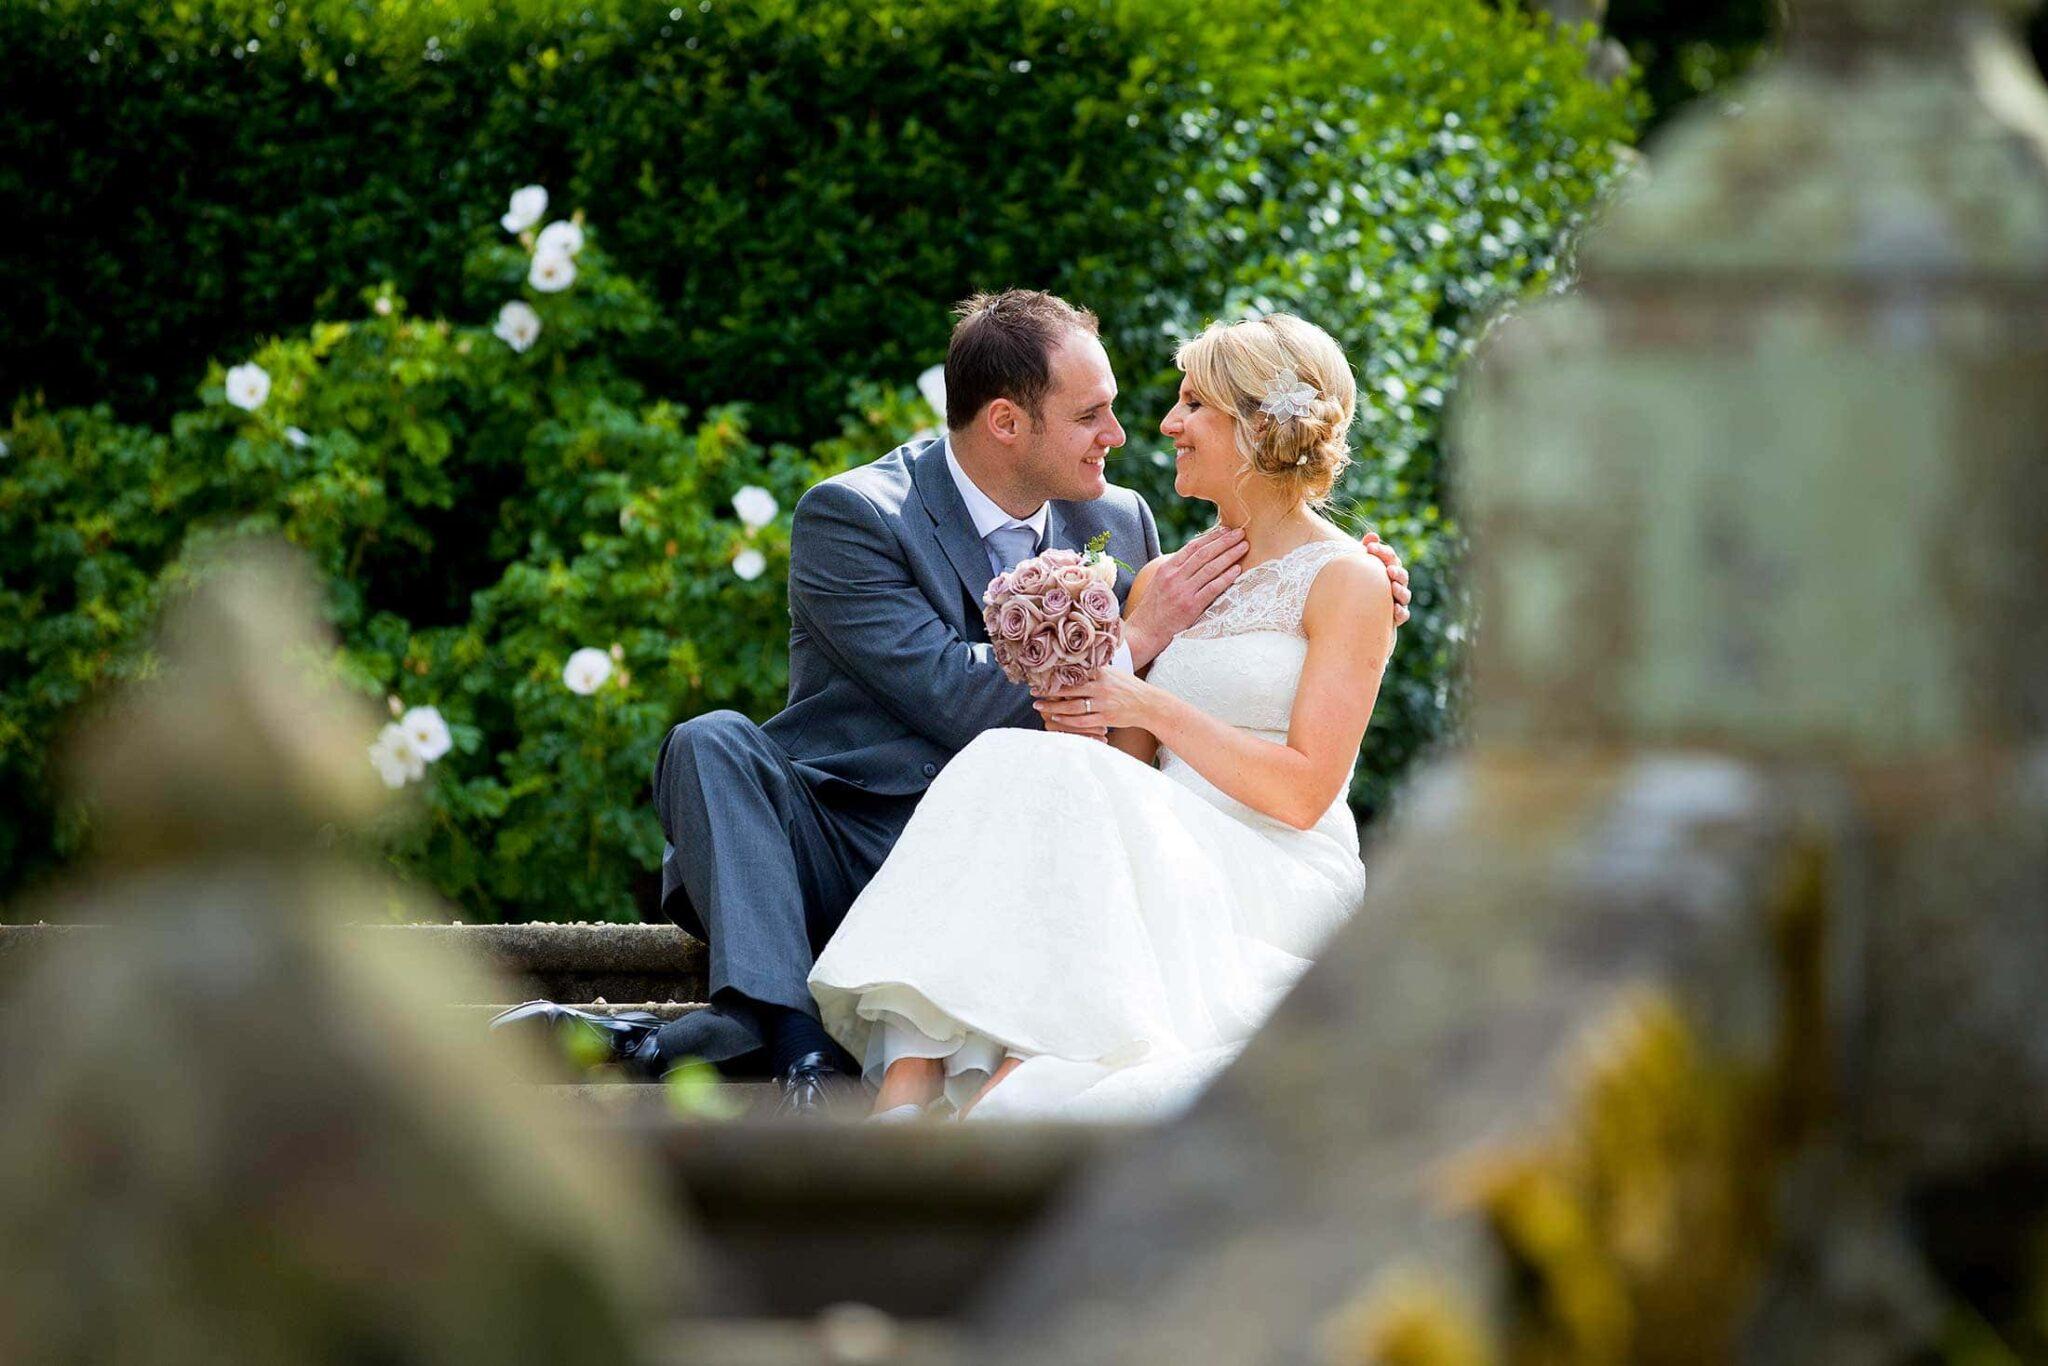 Hengrave Hall wedding photos of Rachel and Dougan